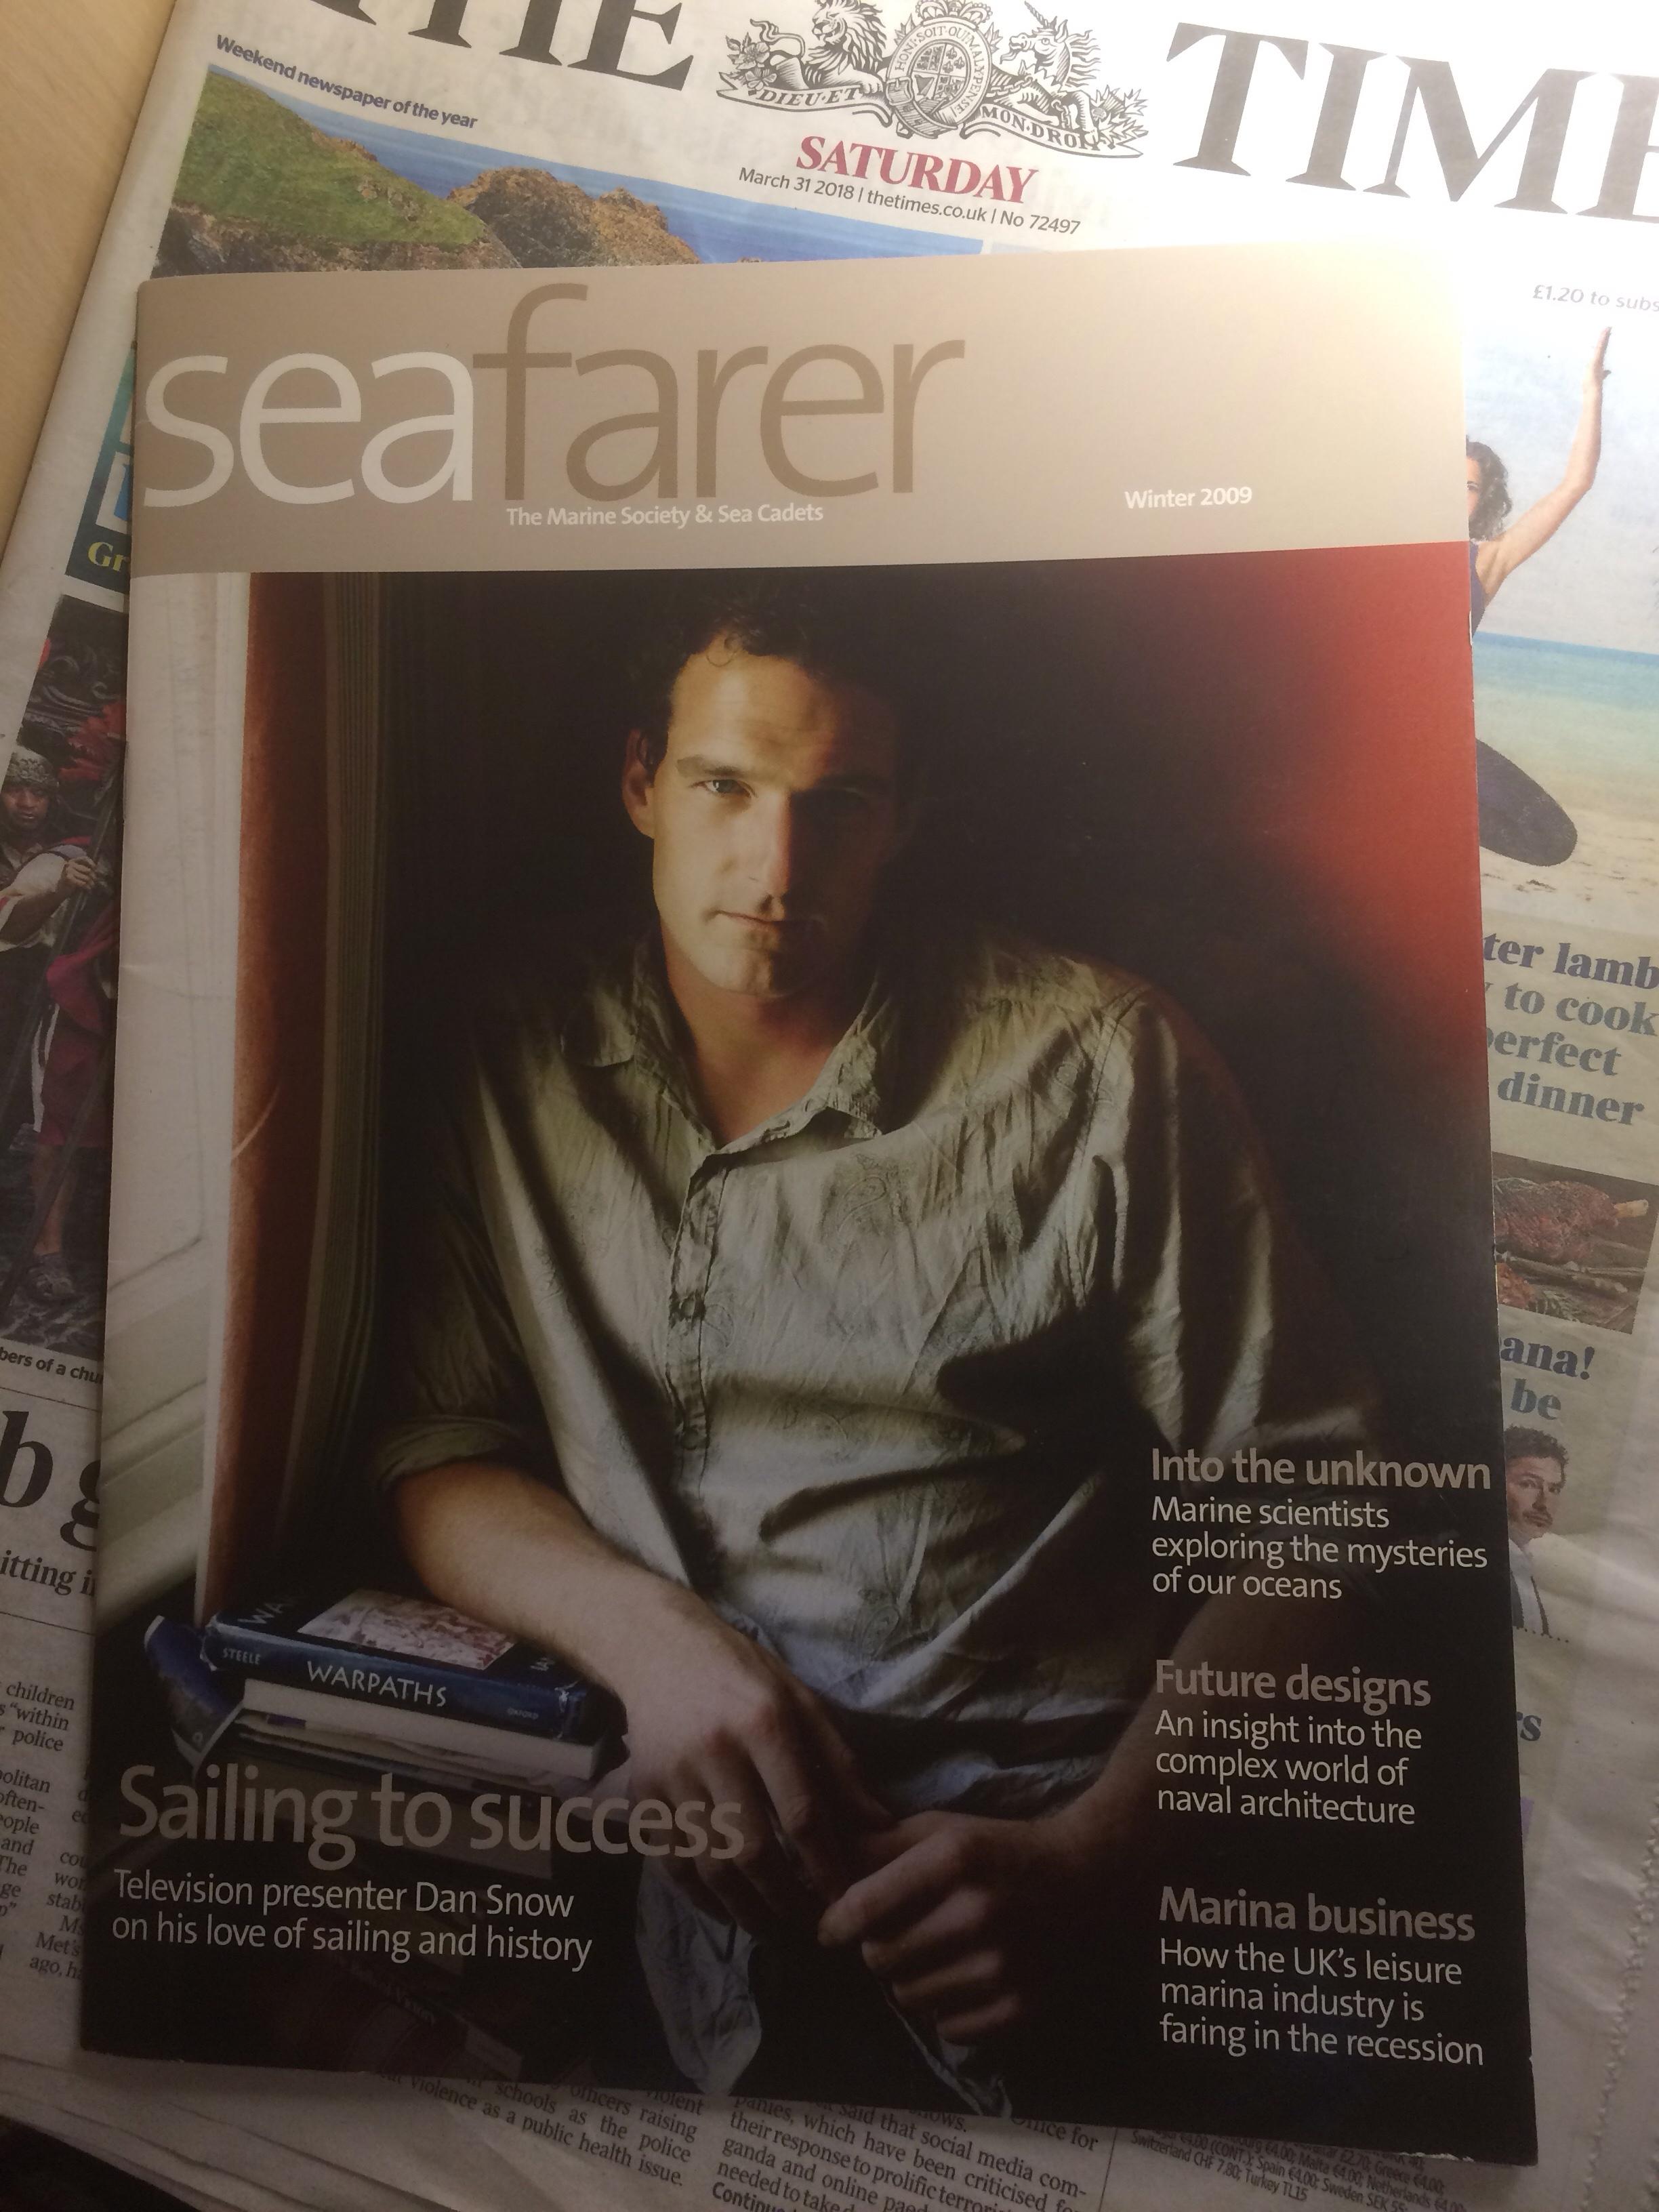 Historian and BBC presenter Dan Snow on the front cover of Seafarer magazine